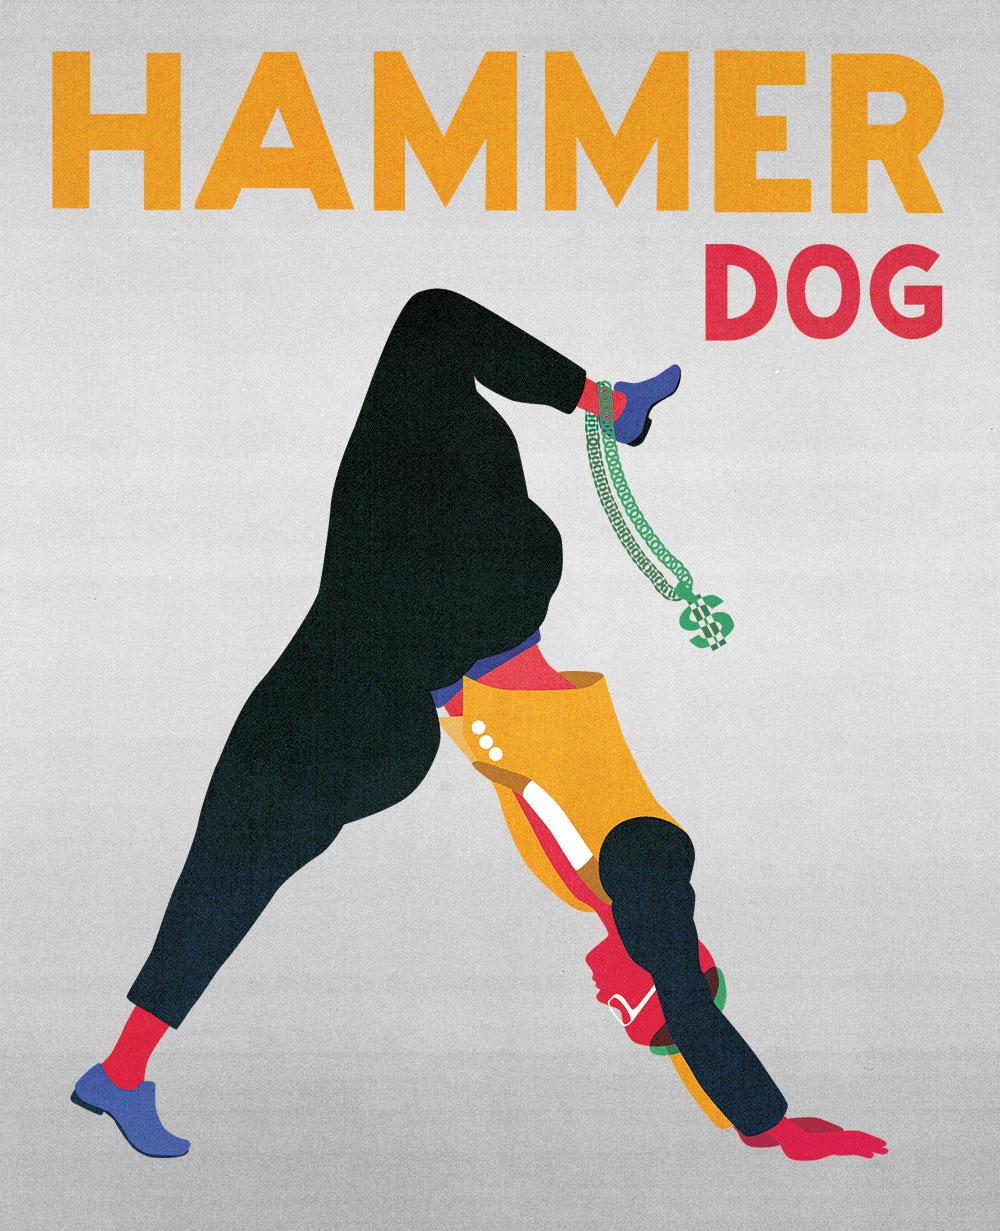 HammerDog_1000.jpg